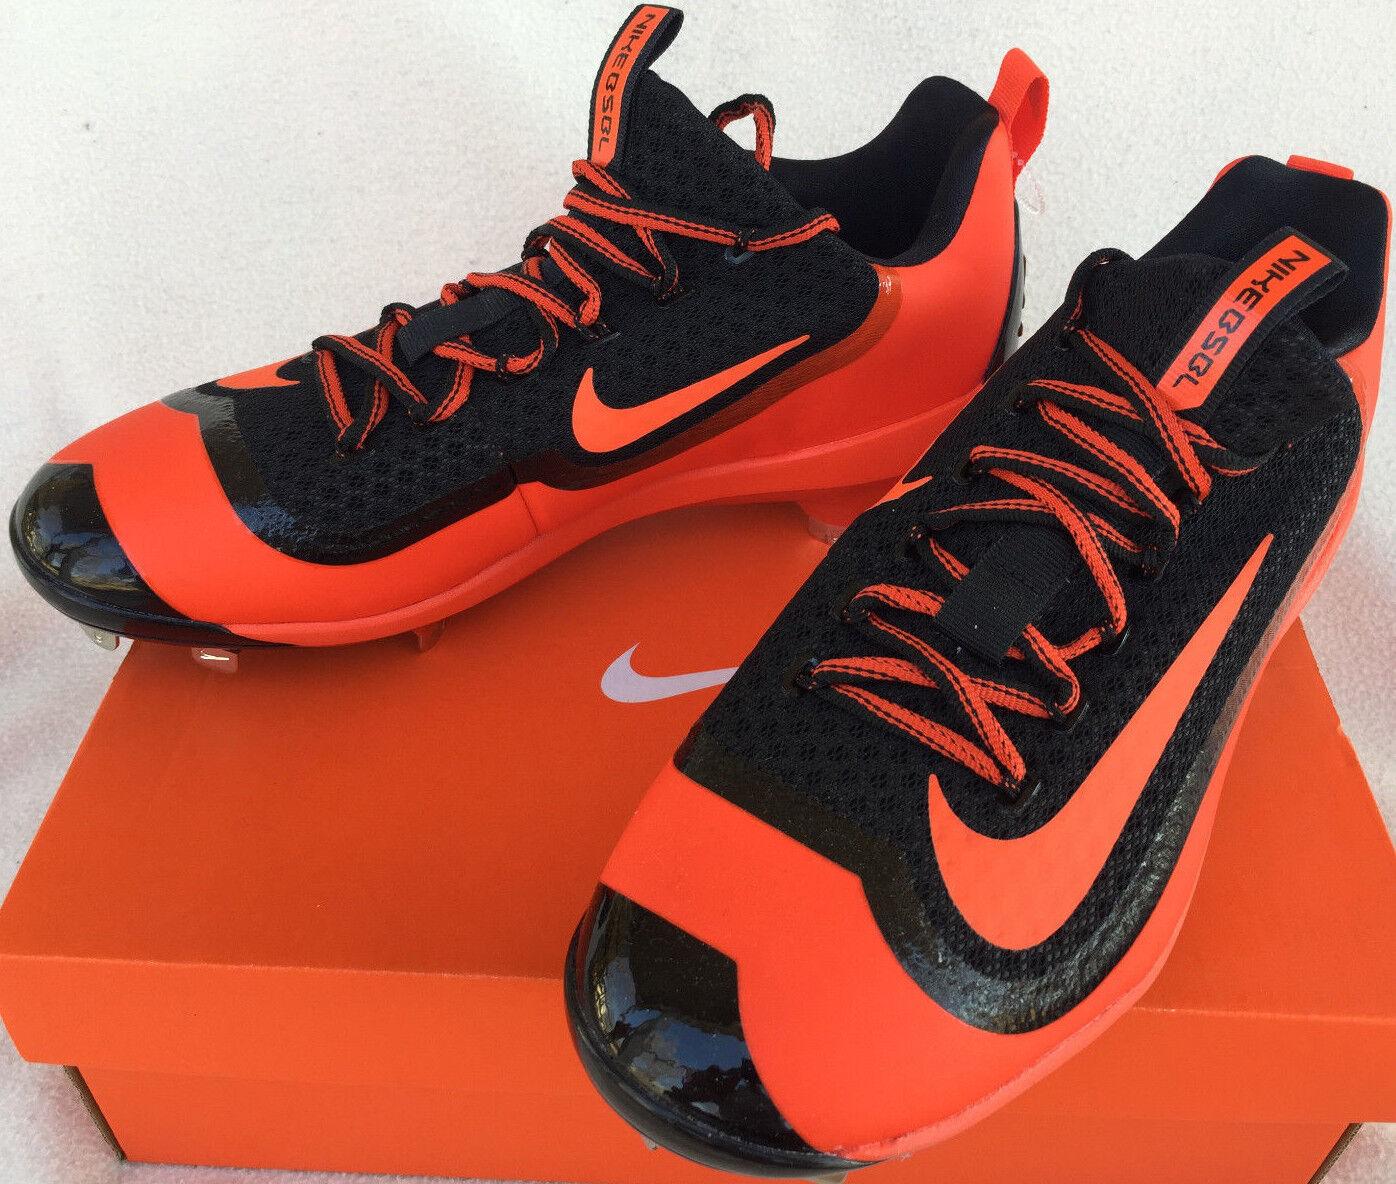 Nike Air Max Huarache BSBL 819137-080 Metal Baseball Cleats Shoes Men's 11 MLB